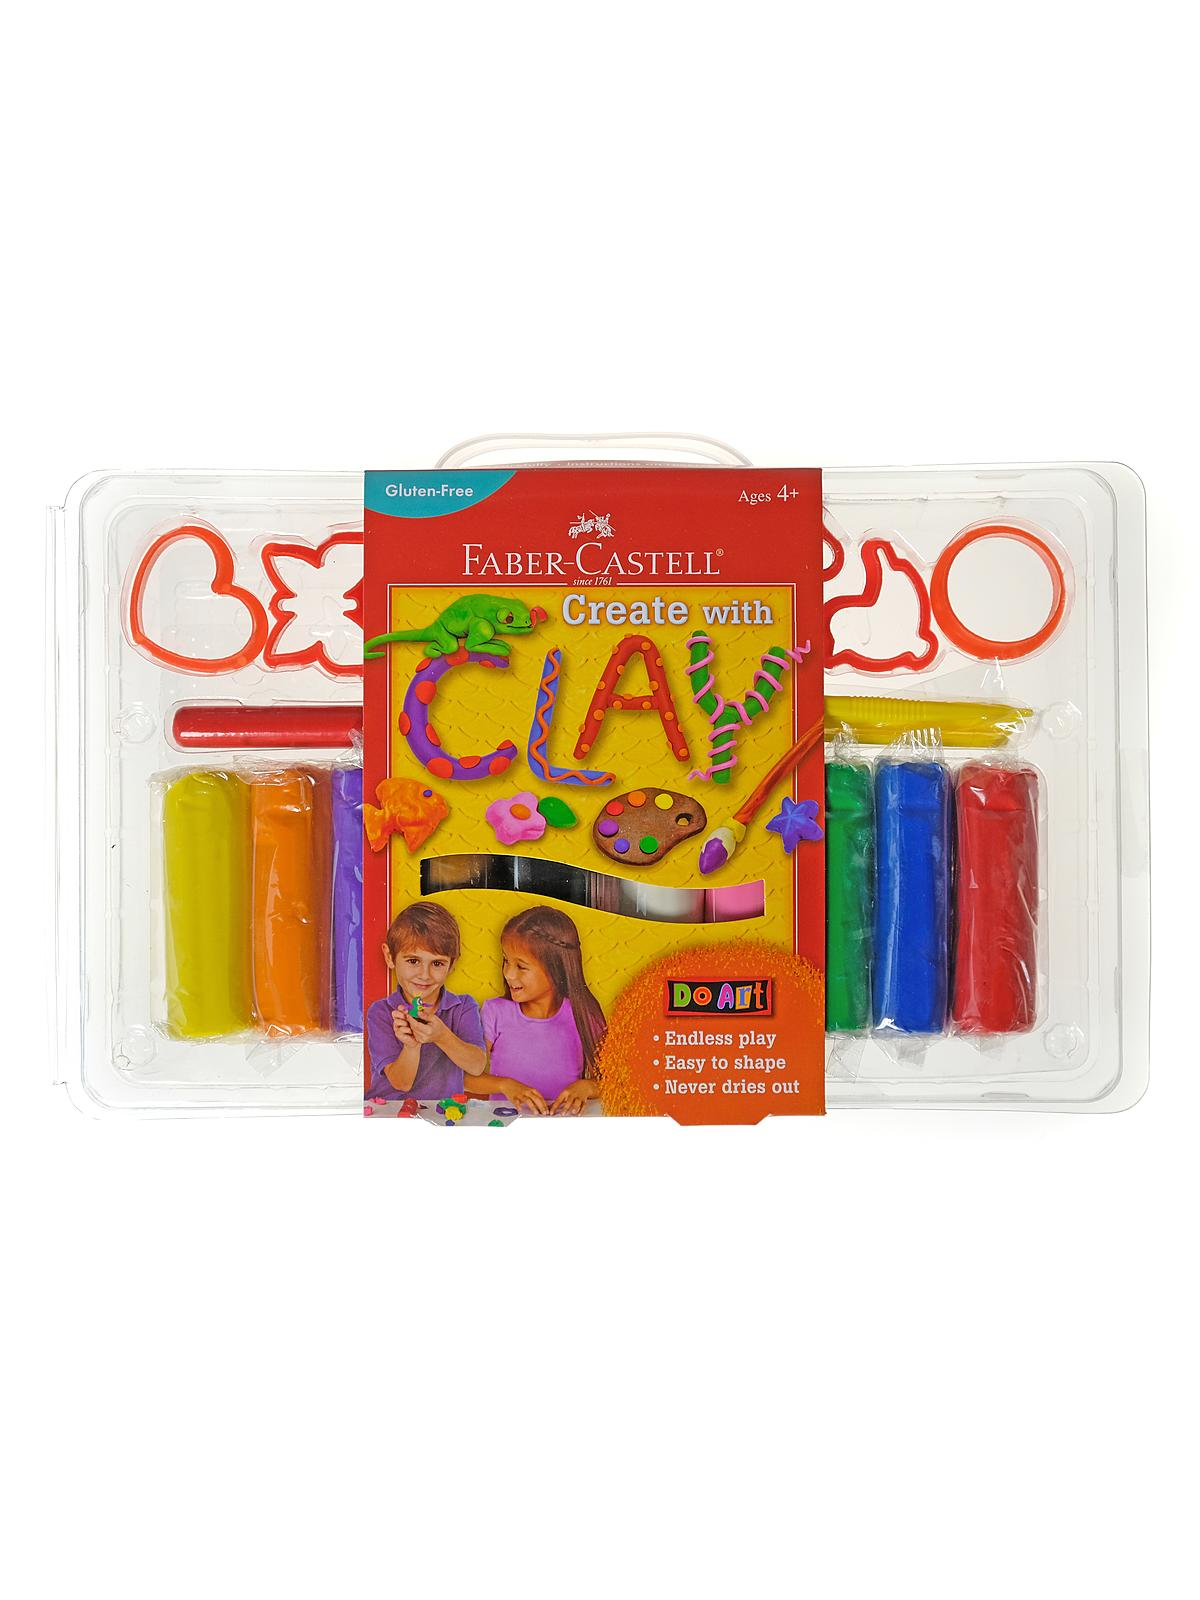 Do Art Create with Clay Set